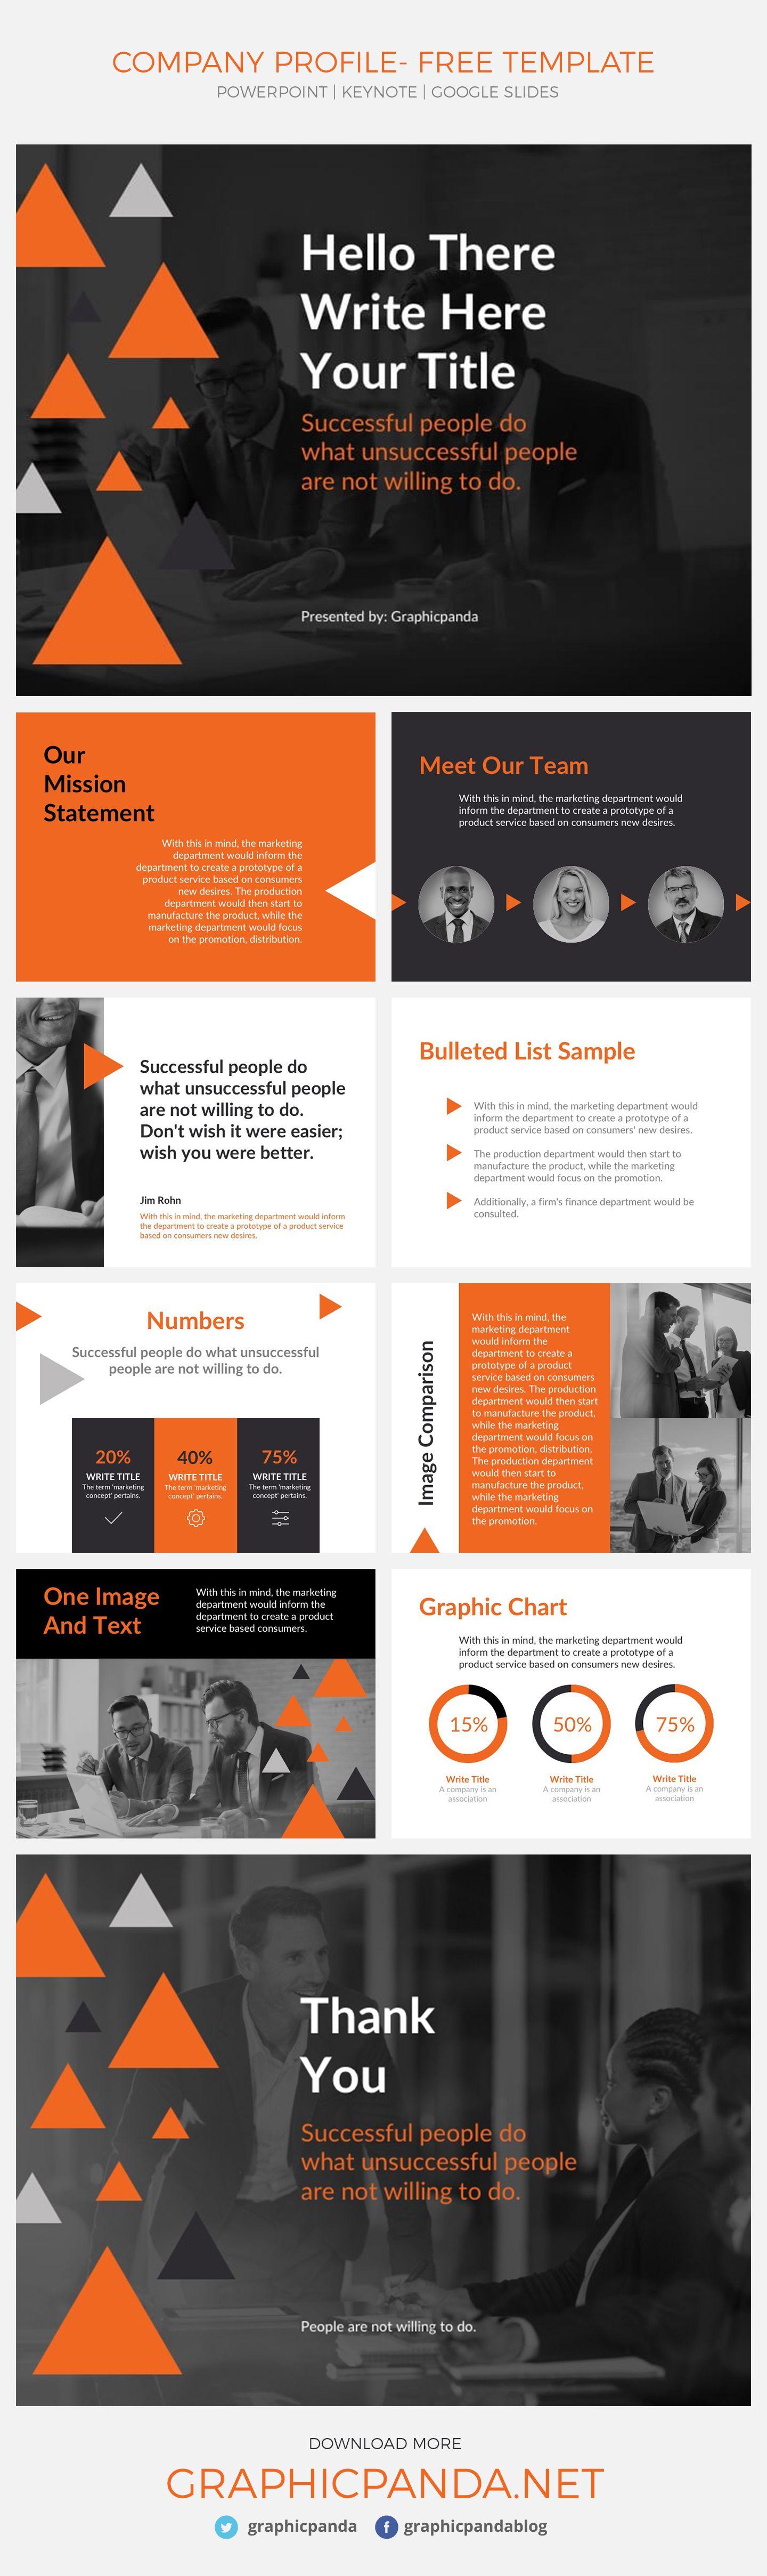 Company Profile Sample Download Donation Transmittal Document Example  F0511e55b36186fad65147bd77acd50b Company Profile Sample Download  Donationhtml  Company Profile Sample Download